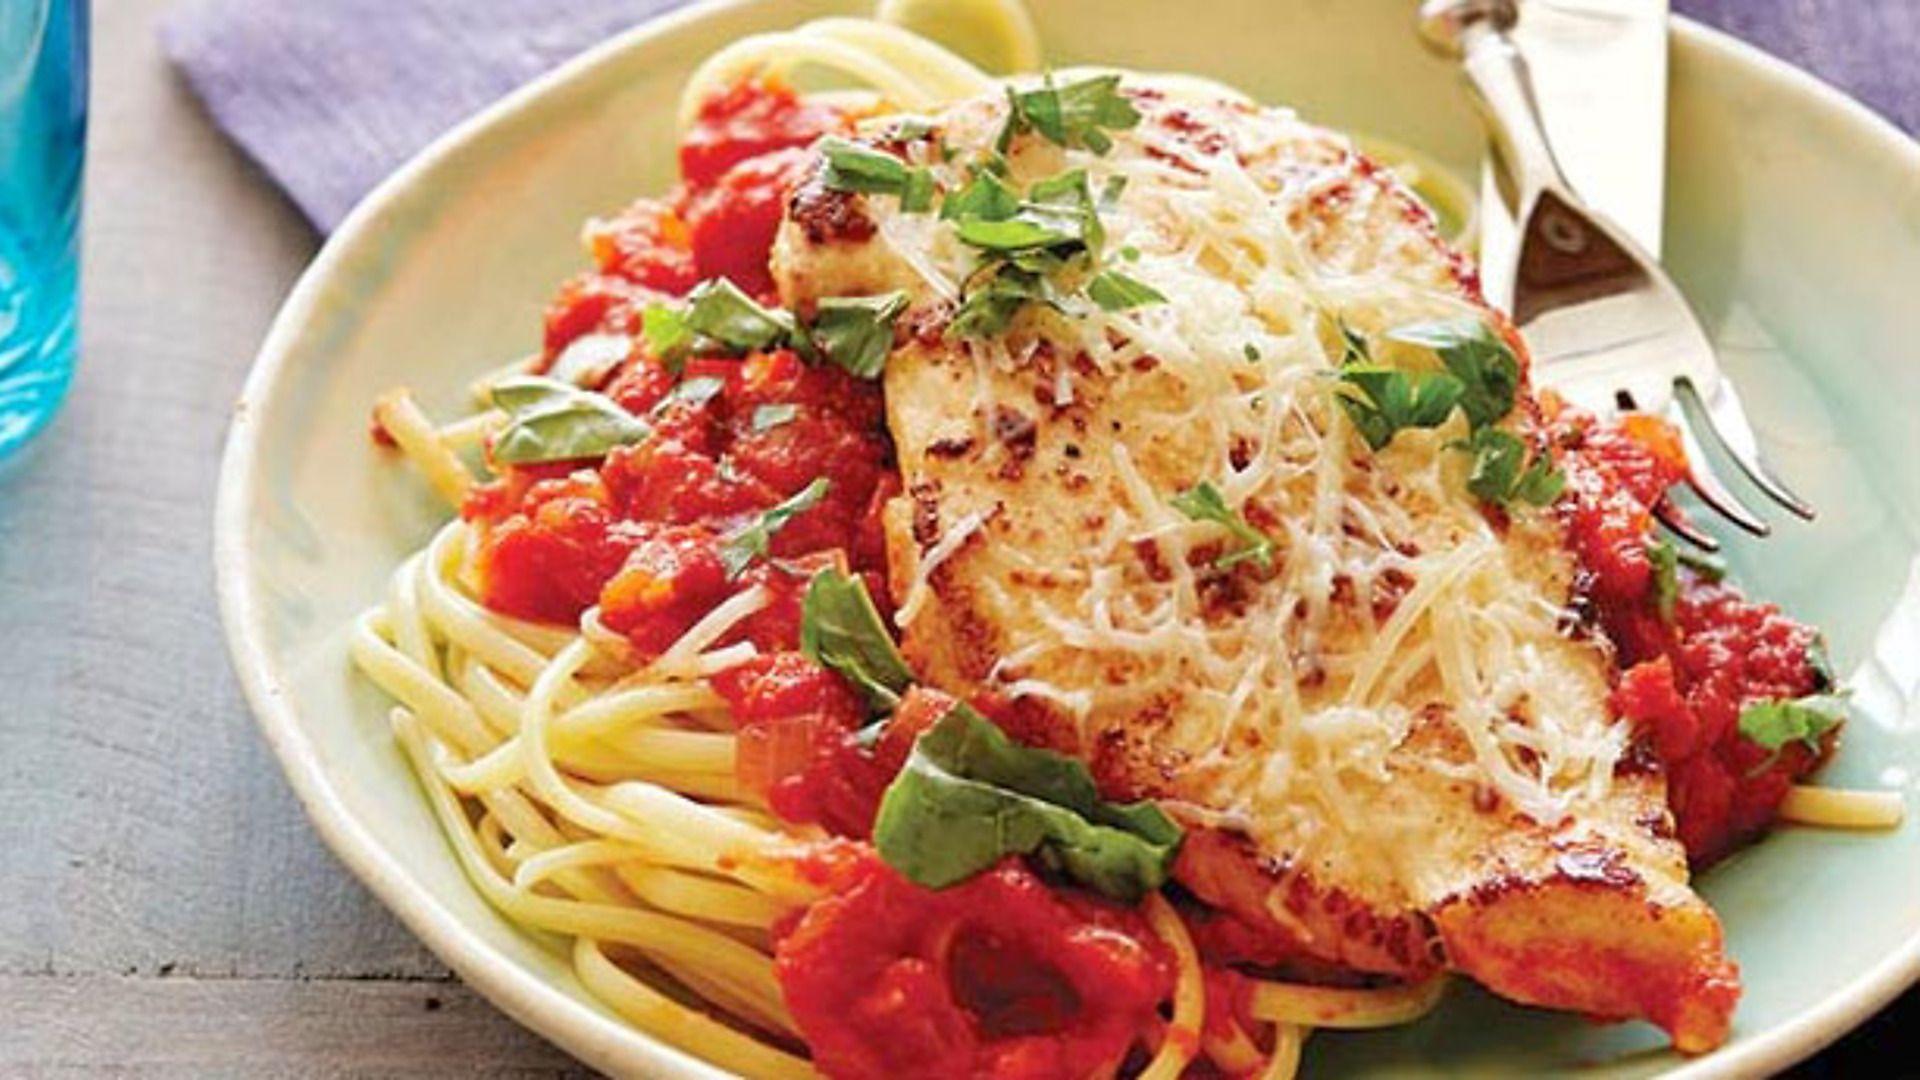 Chicken spaghetti recipe chicken spaghetti recipes chicken chicken spaghetti recipe by ree drummond food network uk forumfinder Gallery